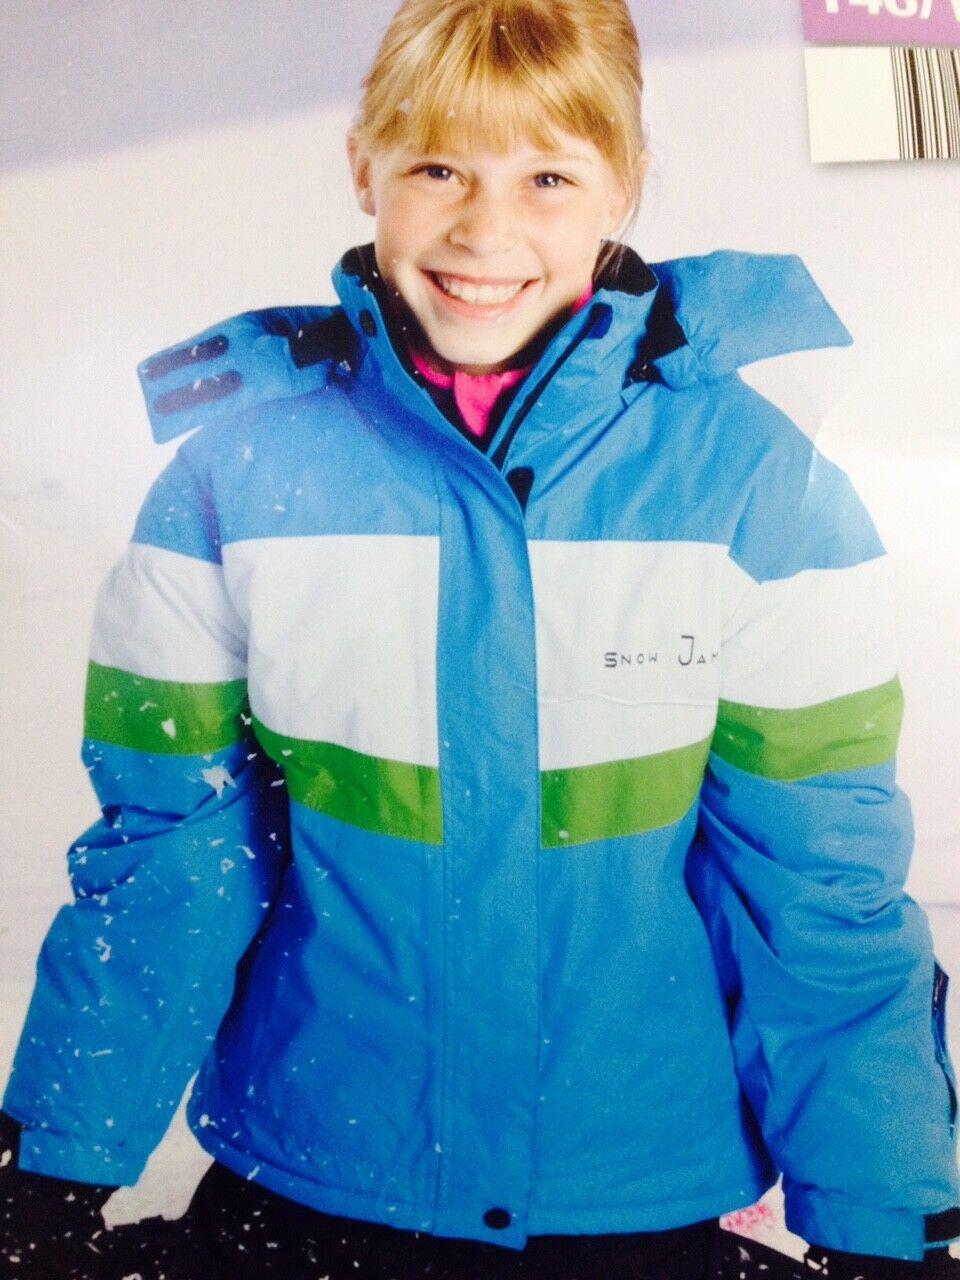 Kinder Ski Jacke Snowboard Jungen Mädchen Winterjacke Skijacke